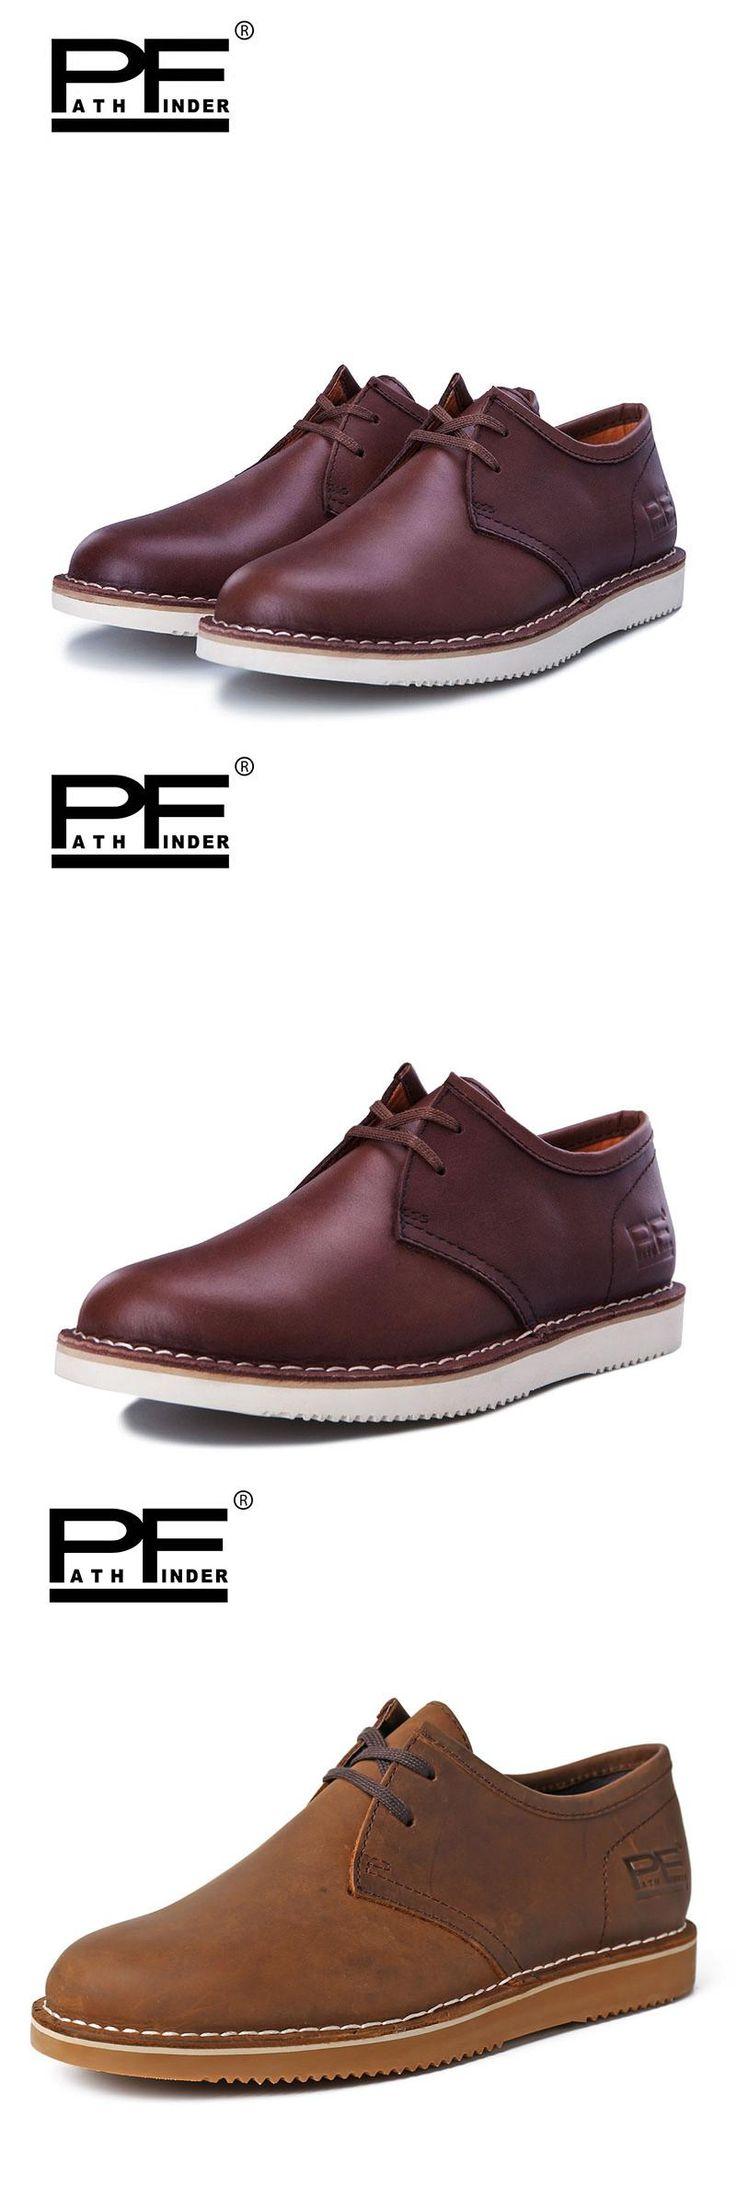 Pathfinder Men Work&Safety Shoes Nubuck Leather Martin Ankle Botas Brand Designer Flats For Men Ankle Casual Shoes